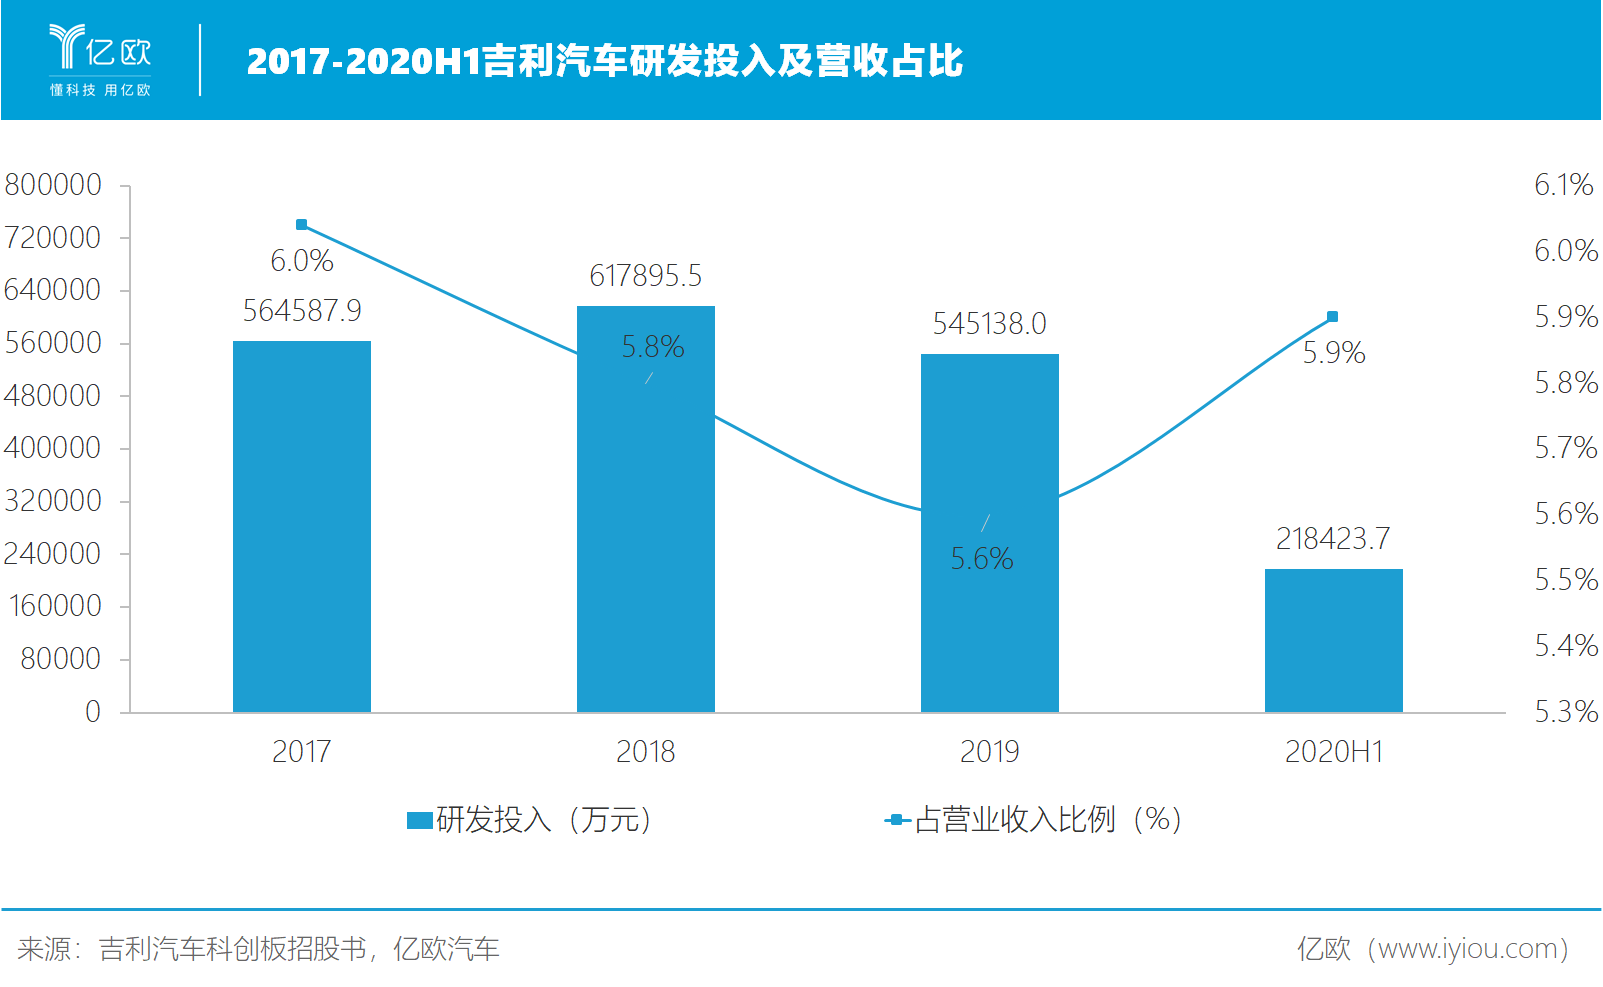 2017-2020H1吉利汽车研发投入及营收占比